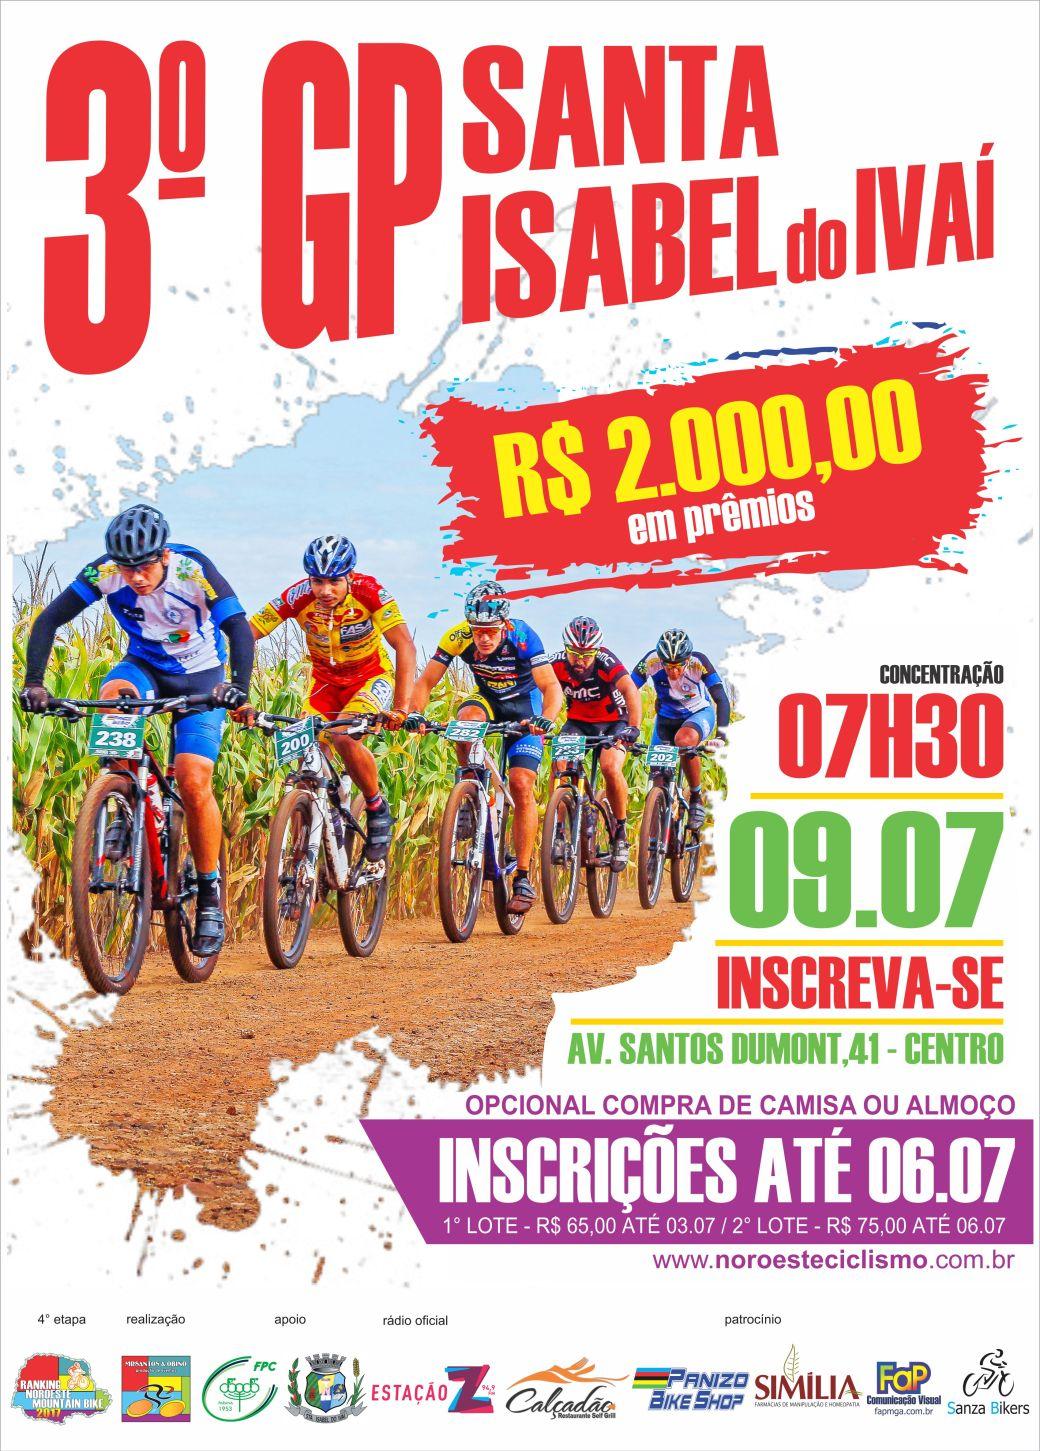 BASE SANTA ISABEL DO IVAI33